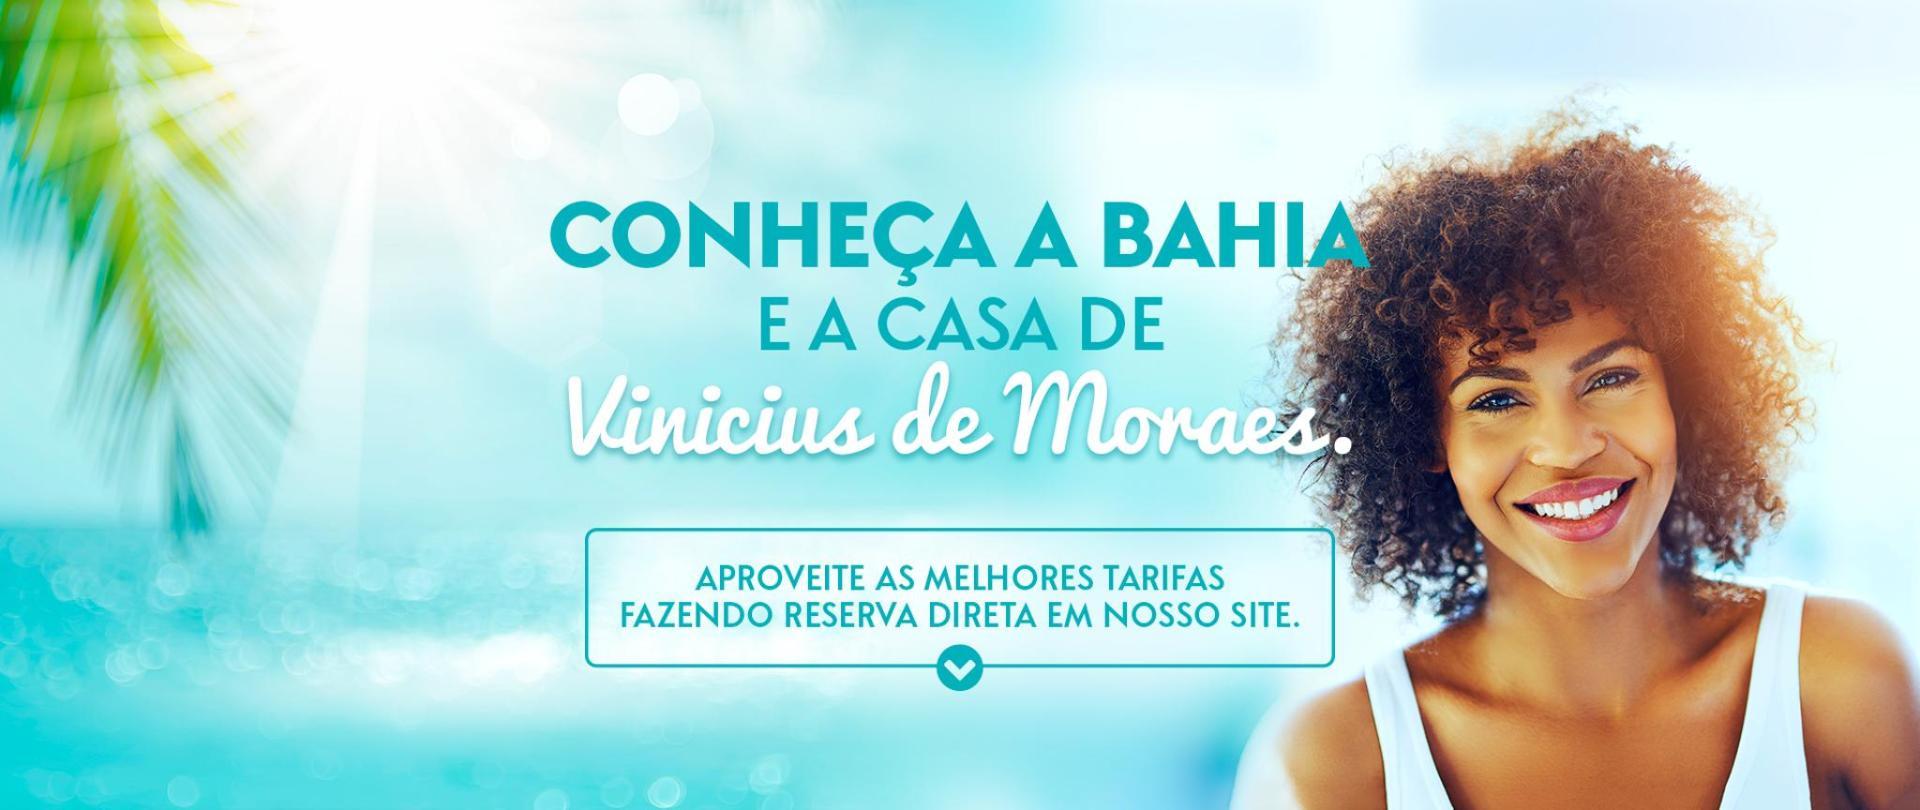 banner-site-venda-pelo-site-1.png